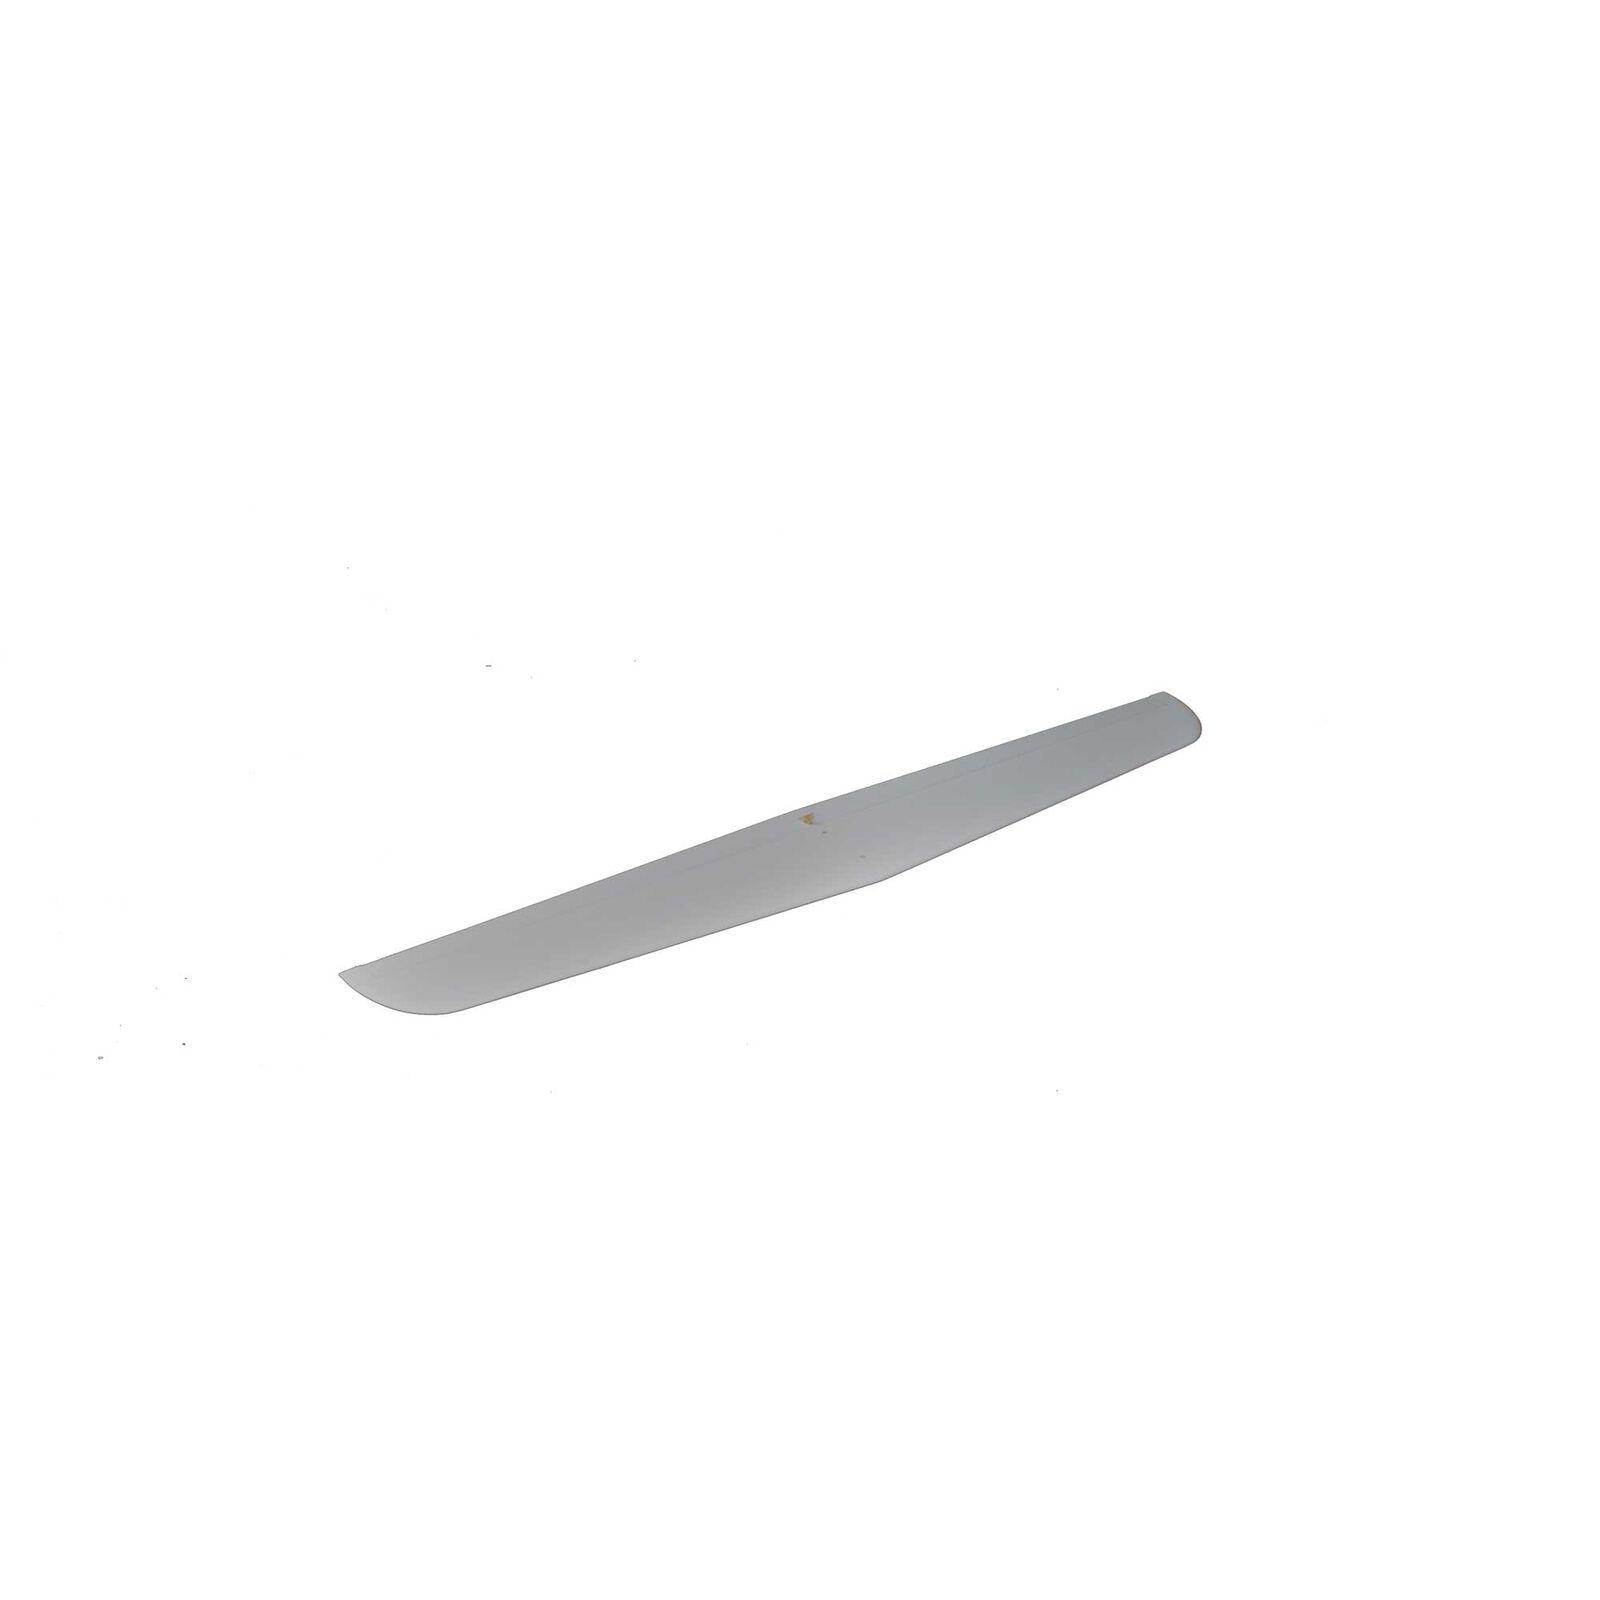 Horizontal Stabilizer: ASH 31 6.4m